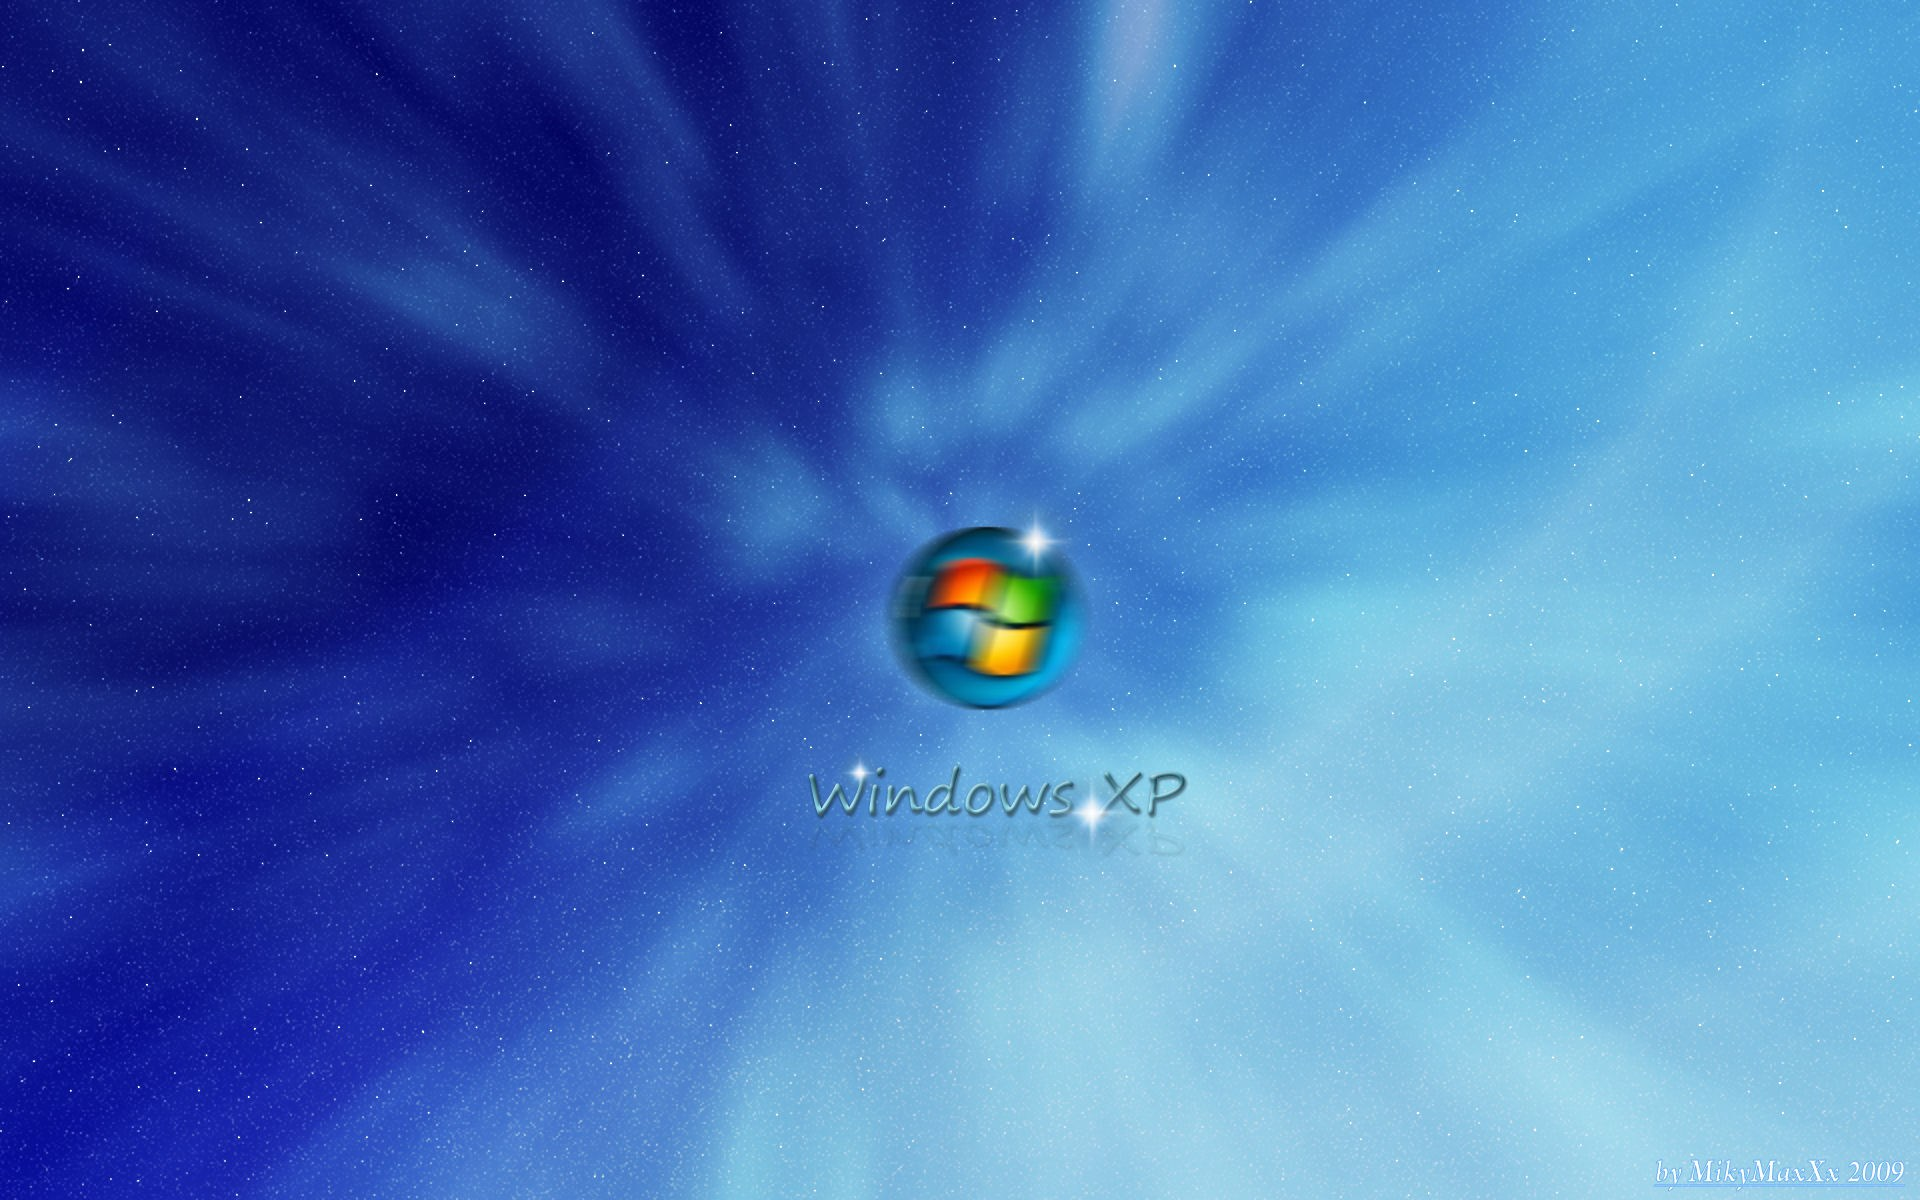 Windows xp wallpaper hd wallpaper 163200 for Fond ecran xp